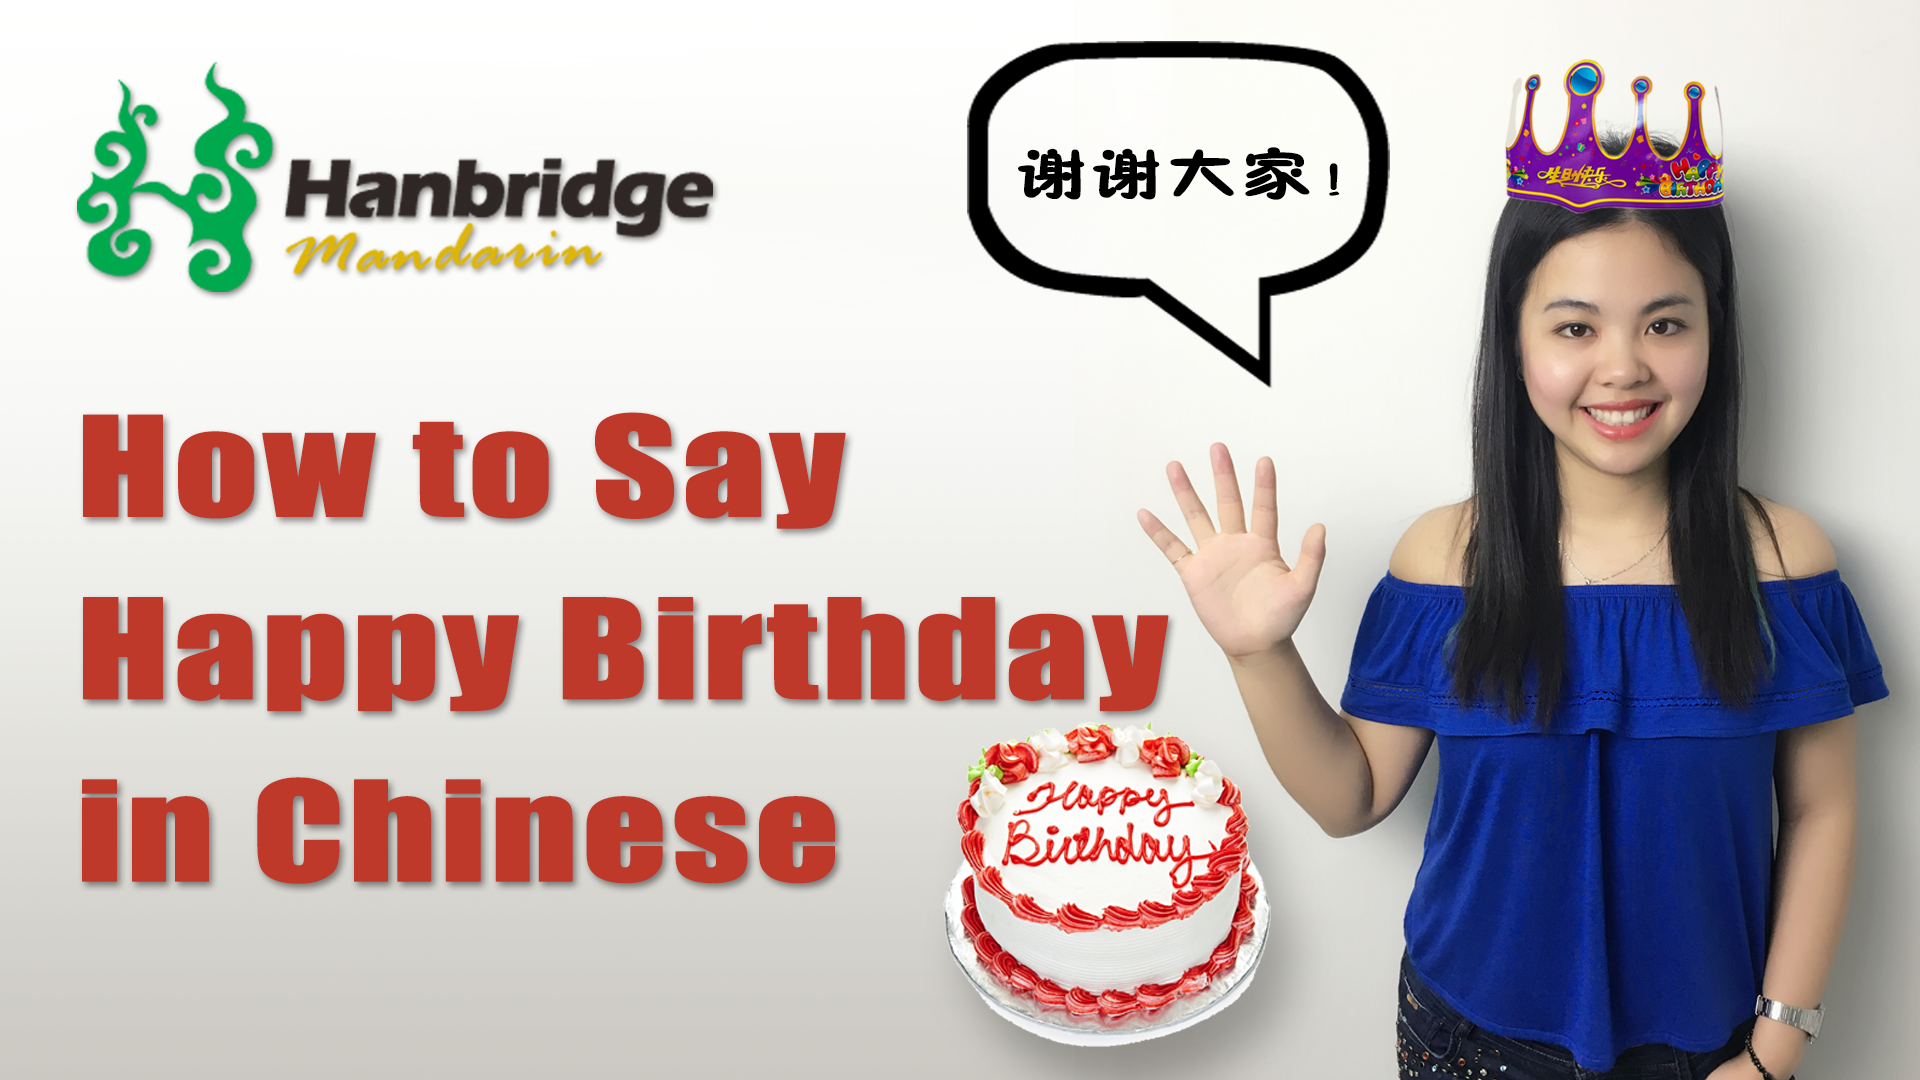 Chinese Birthday Cards Google Search Happy birthday